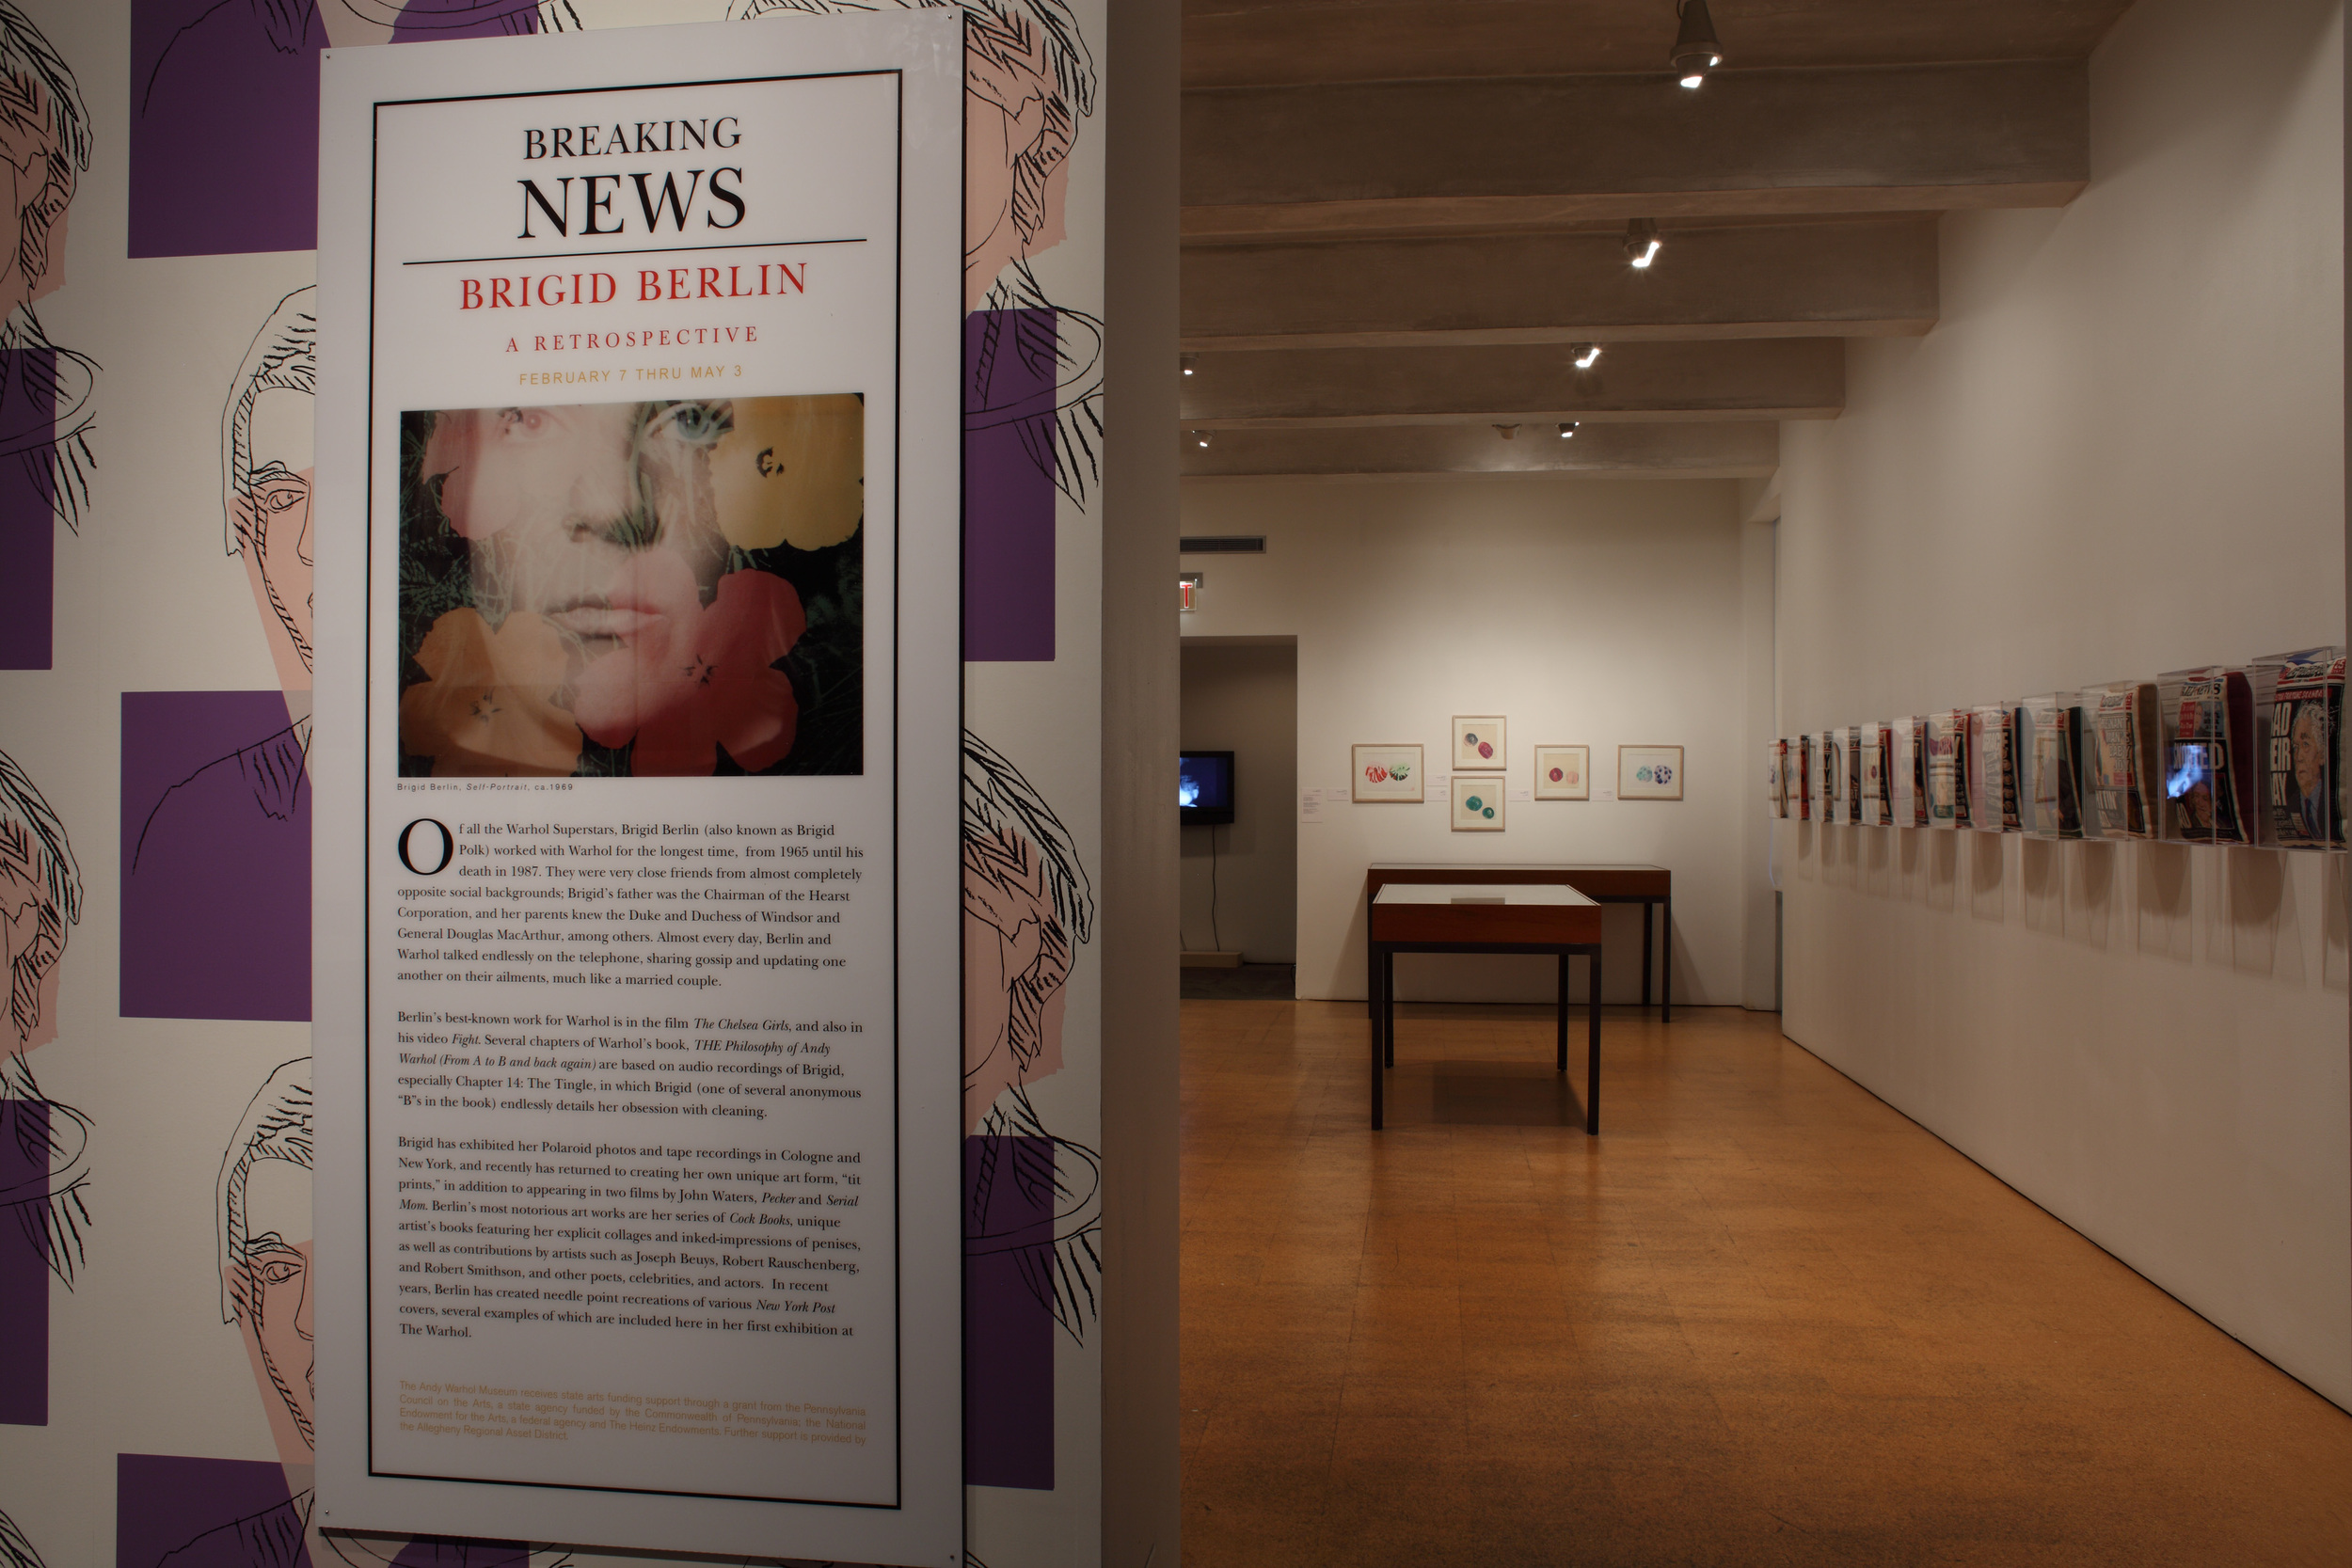 Breaking News - A Brigid Berlin Retrospective at The Andy Warhol Museum, 2009 (1).jpg